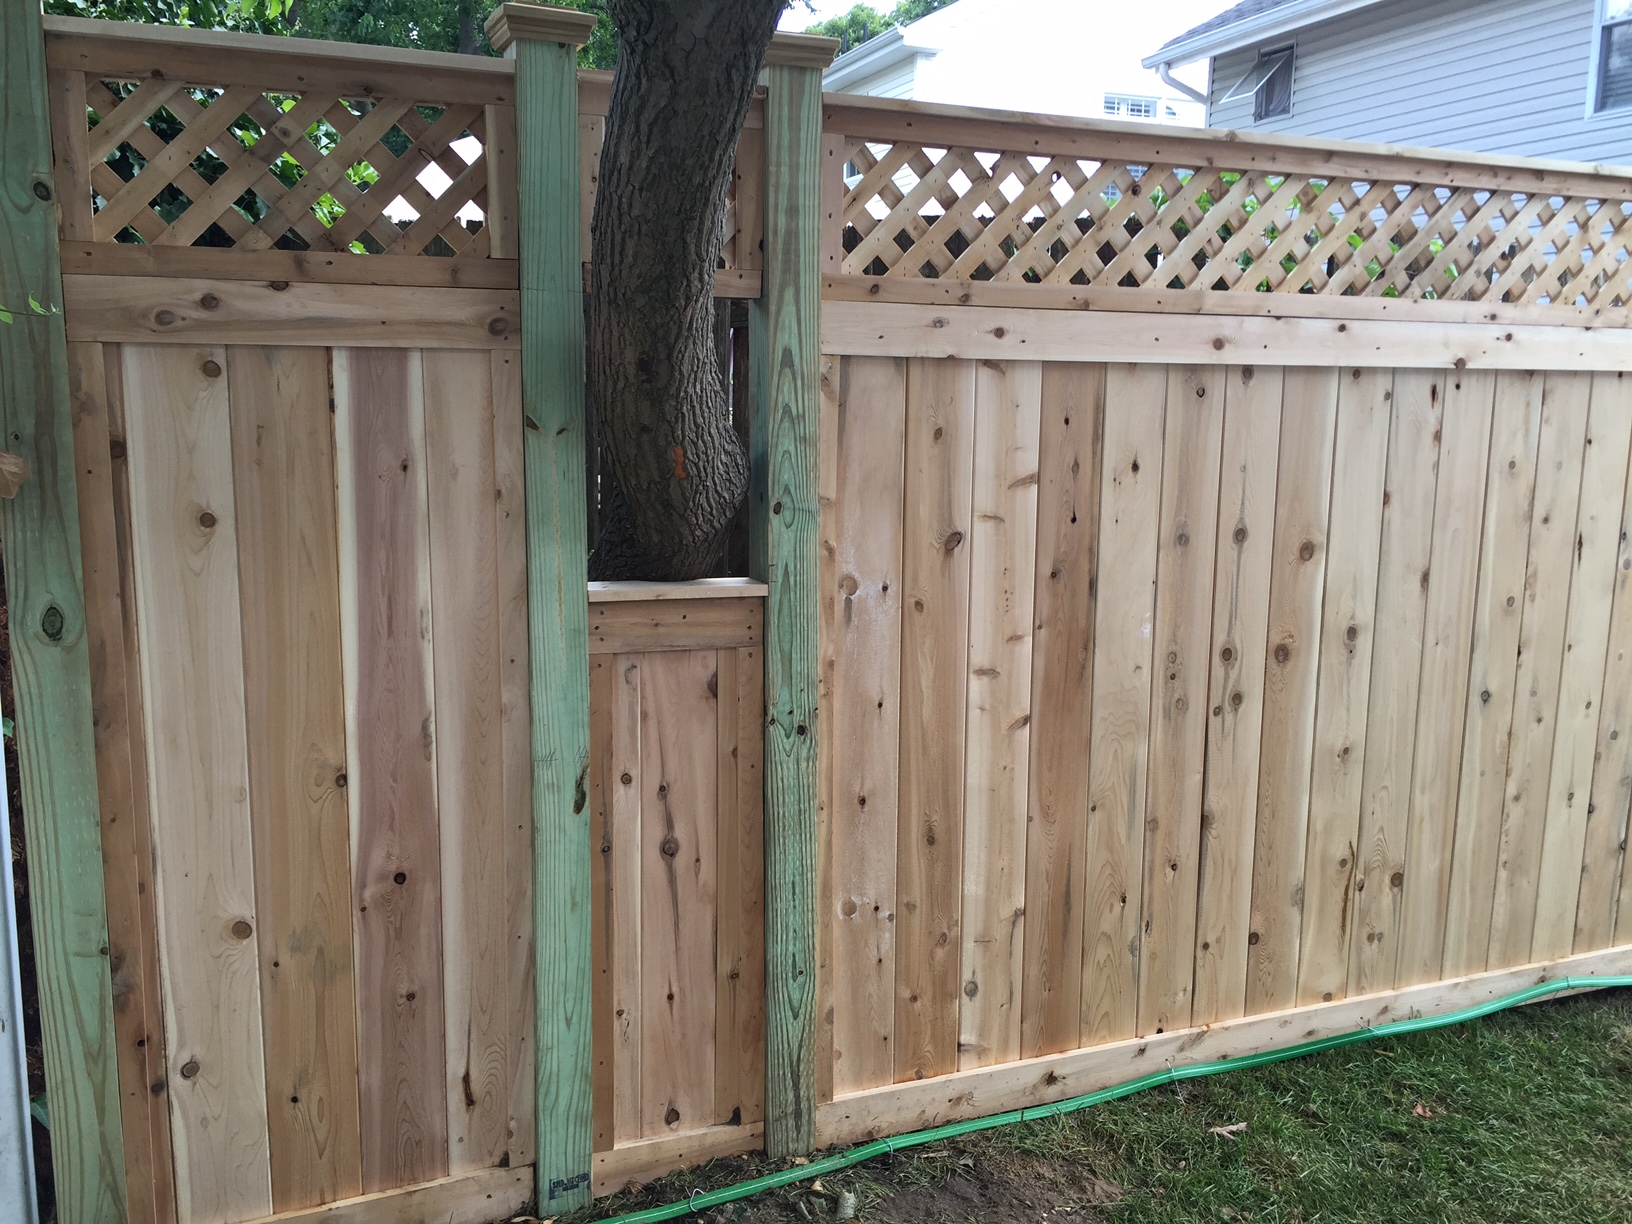 Wood fencing add a link fence company nj fence contractor cedar lattice top fence around a tree baanklon Gallery